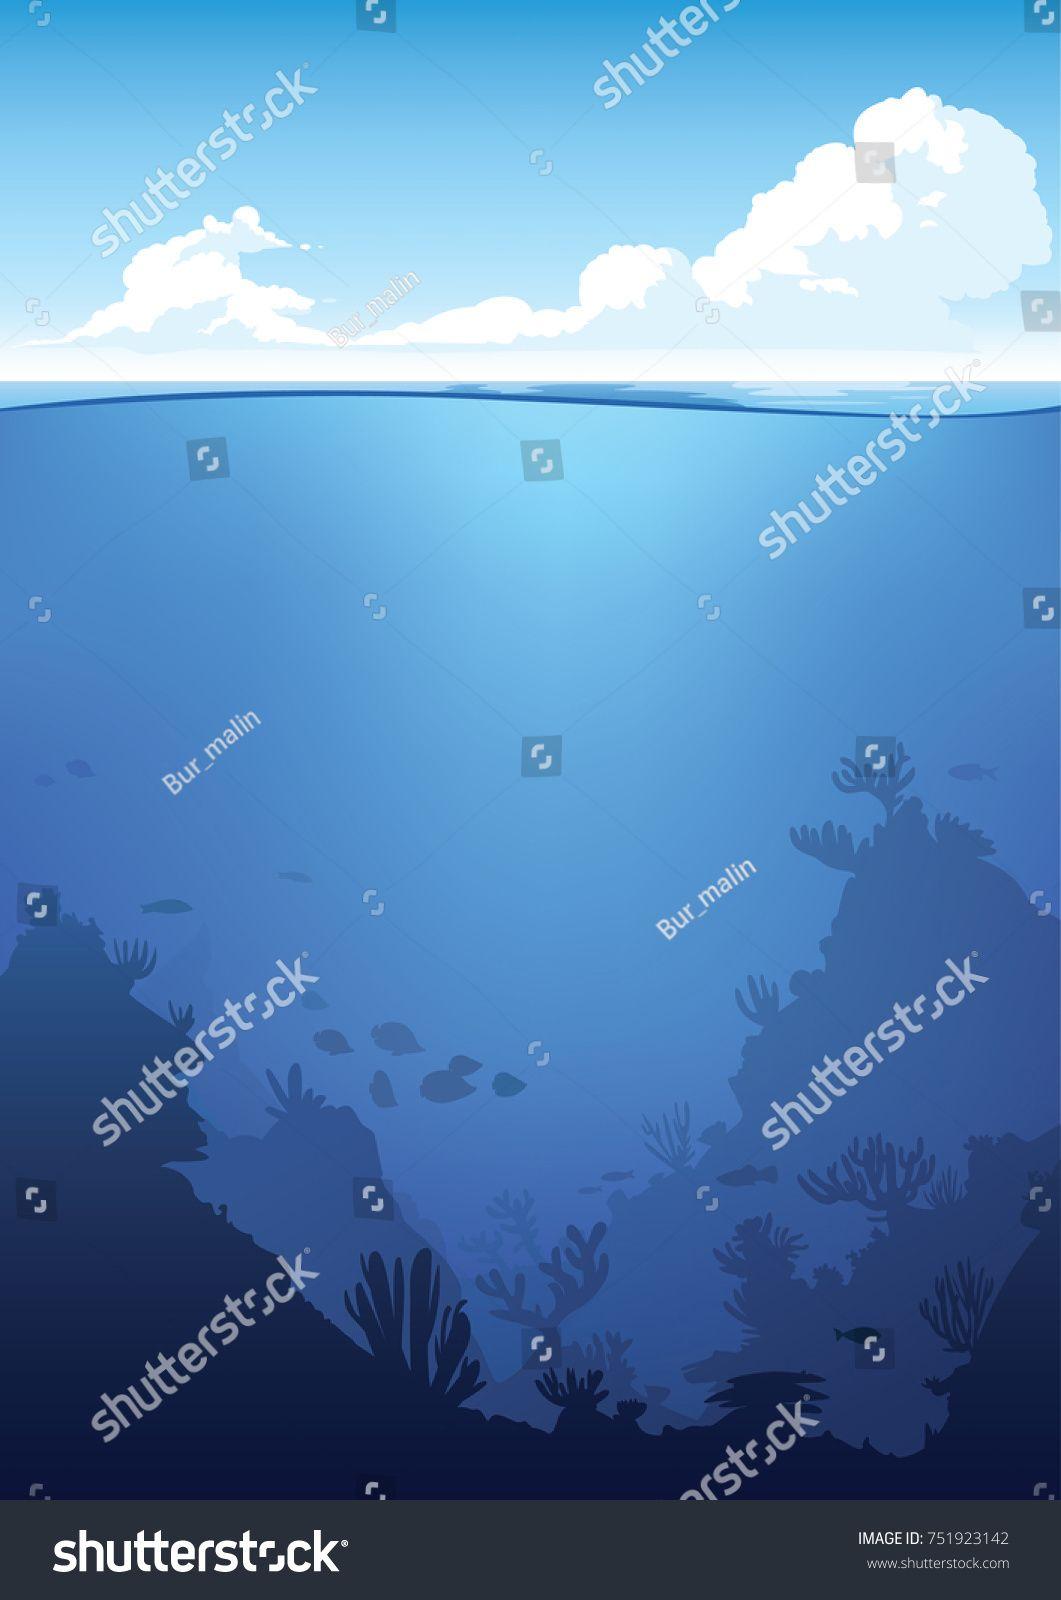 Vector Underwater And Above Water Landscape Ocean Waterline Anime Clean Style Background Design Sponsored Sponsore Background Design Underwater Waterline